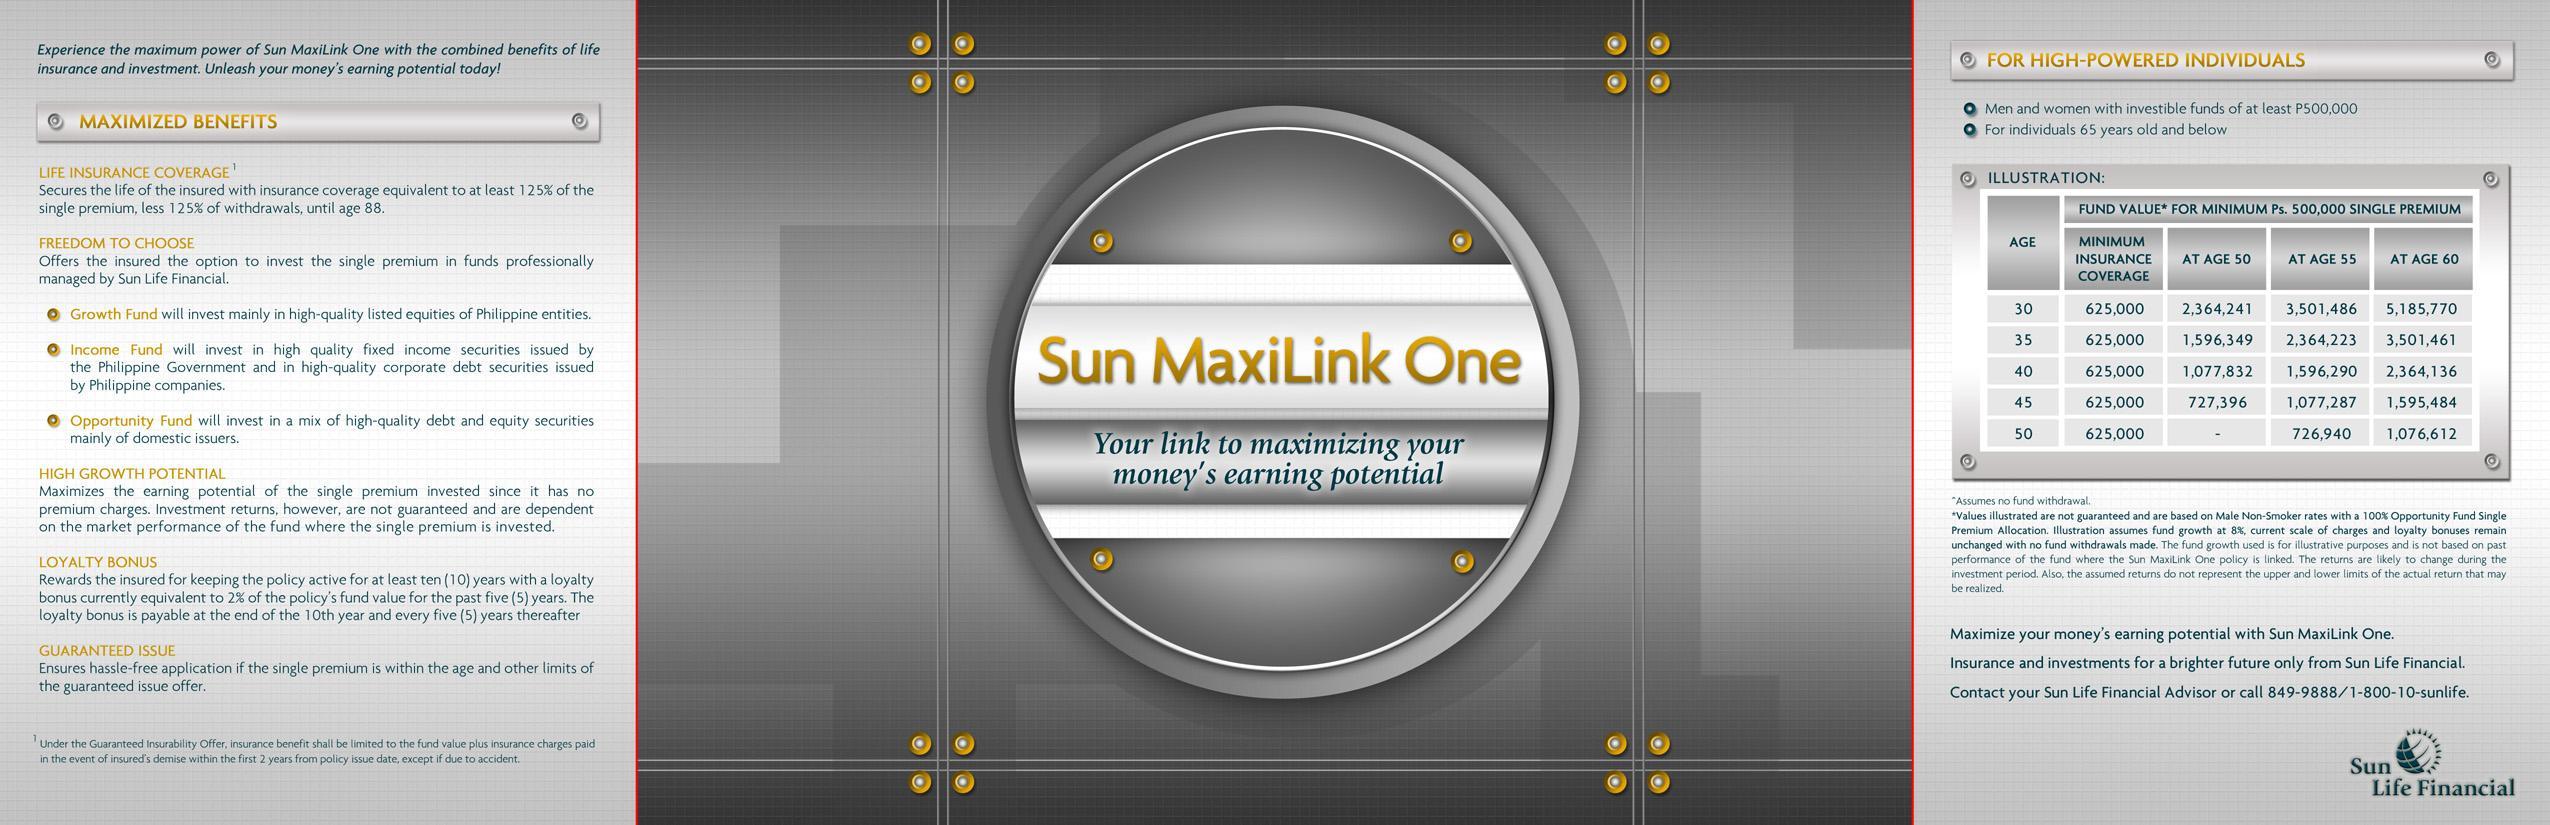 SUN MAXILINK ONE